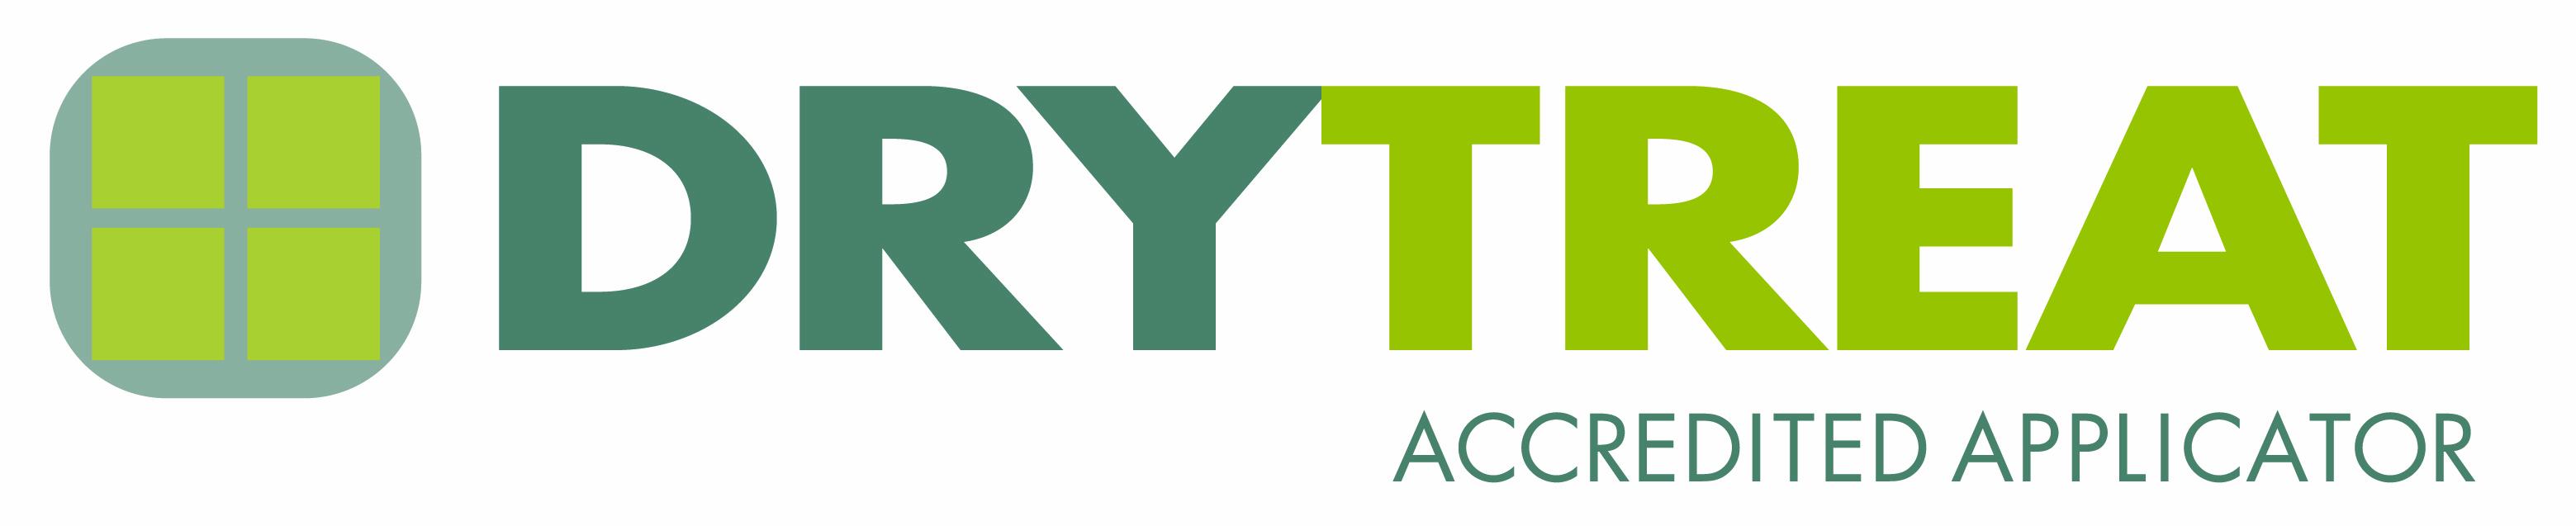 drytreat logo